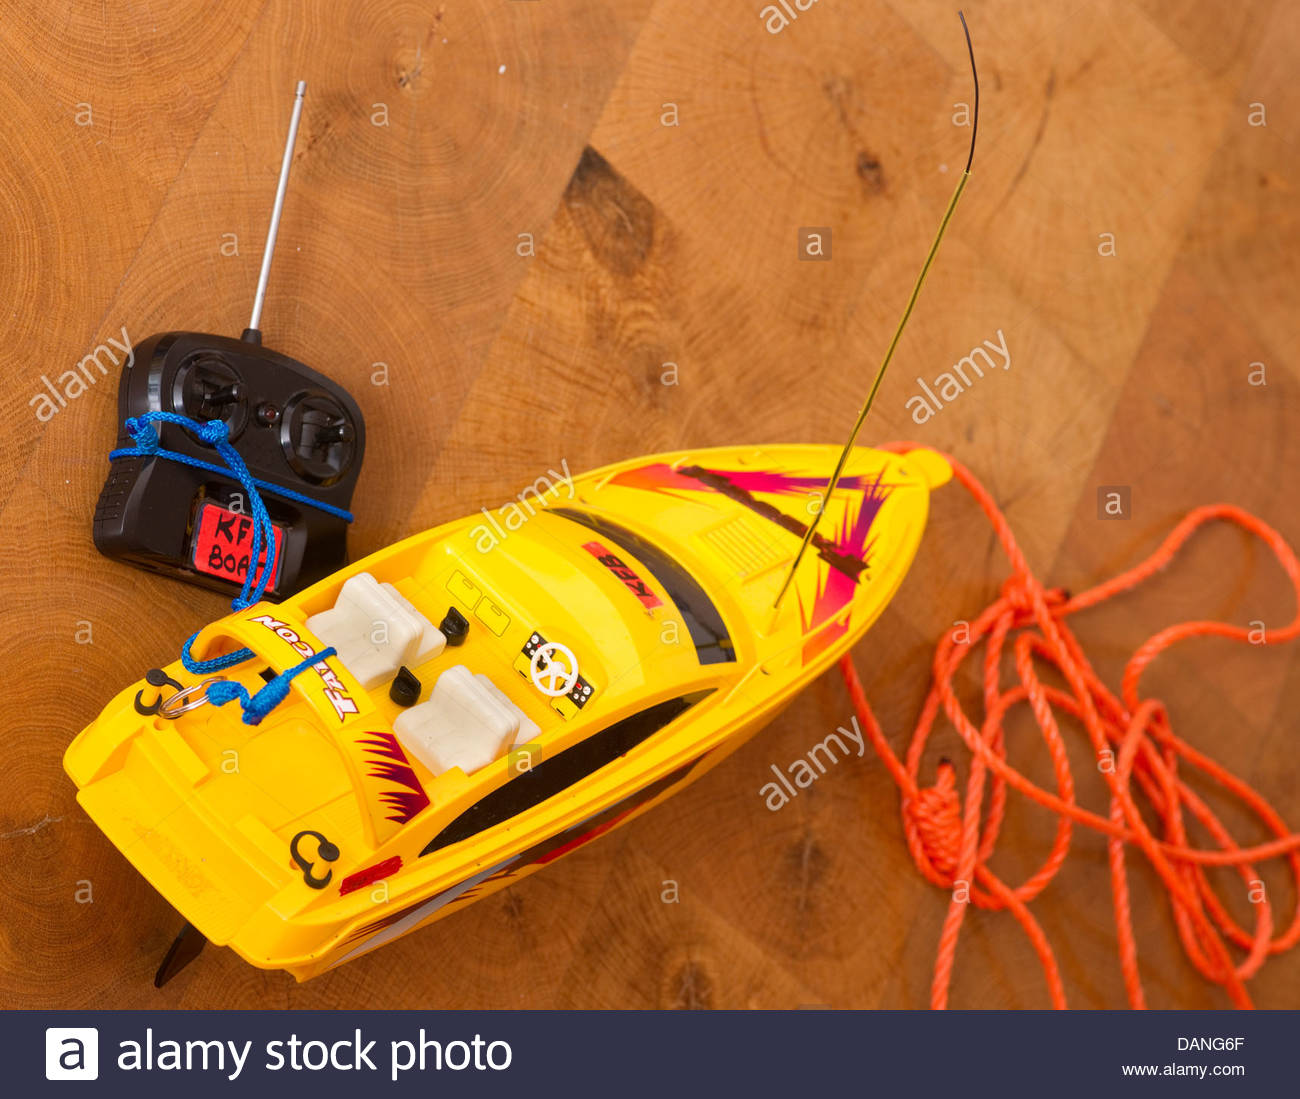 boy children kid kids remote control radio controlled toy - Stock Image